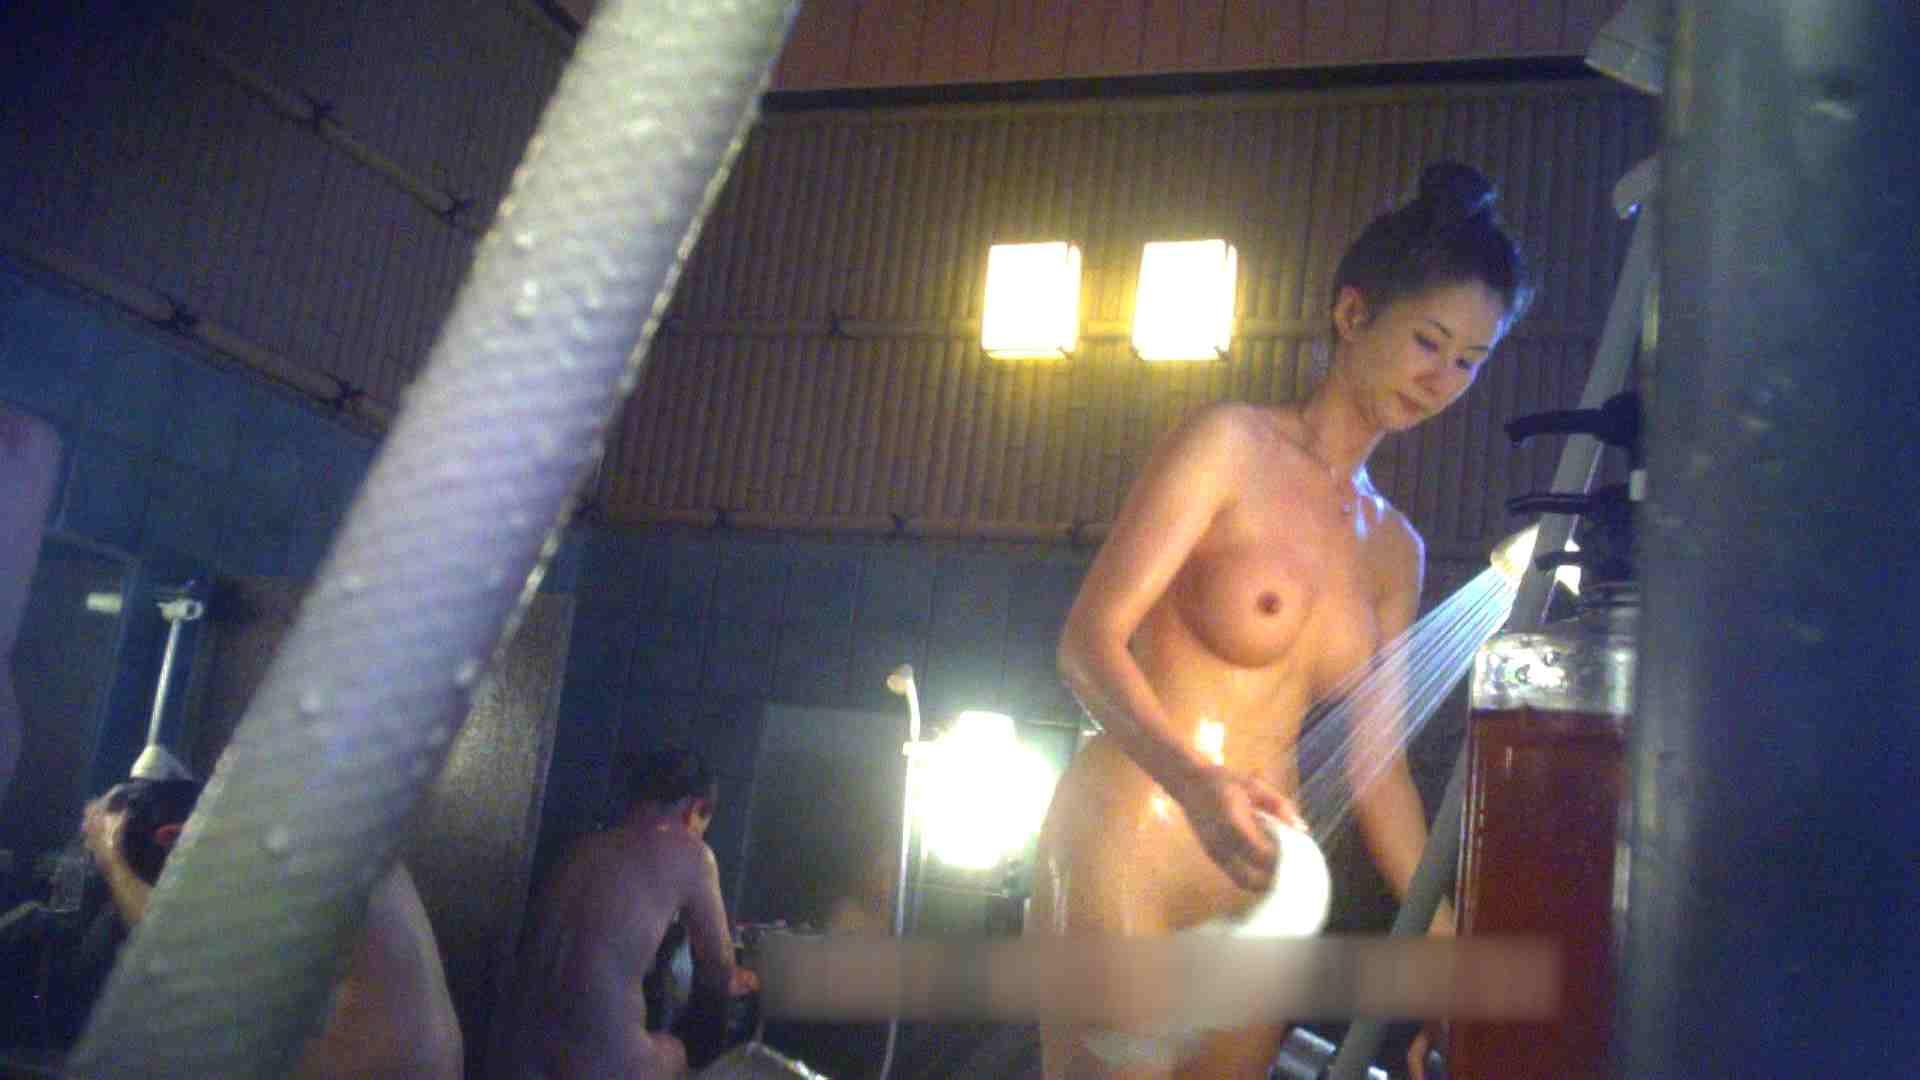 TG.15 【上等兵】高級旅館の爆乳女将で有名っぽい 爆乳 えろ無修正画像 110枚 29